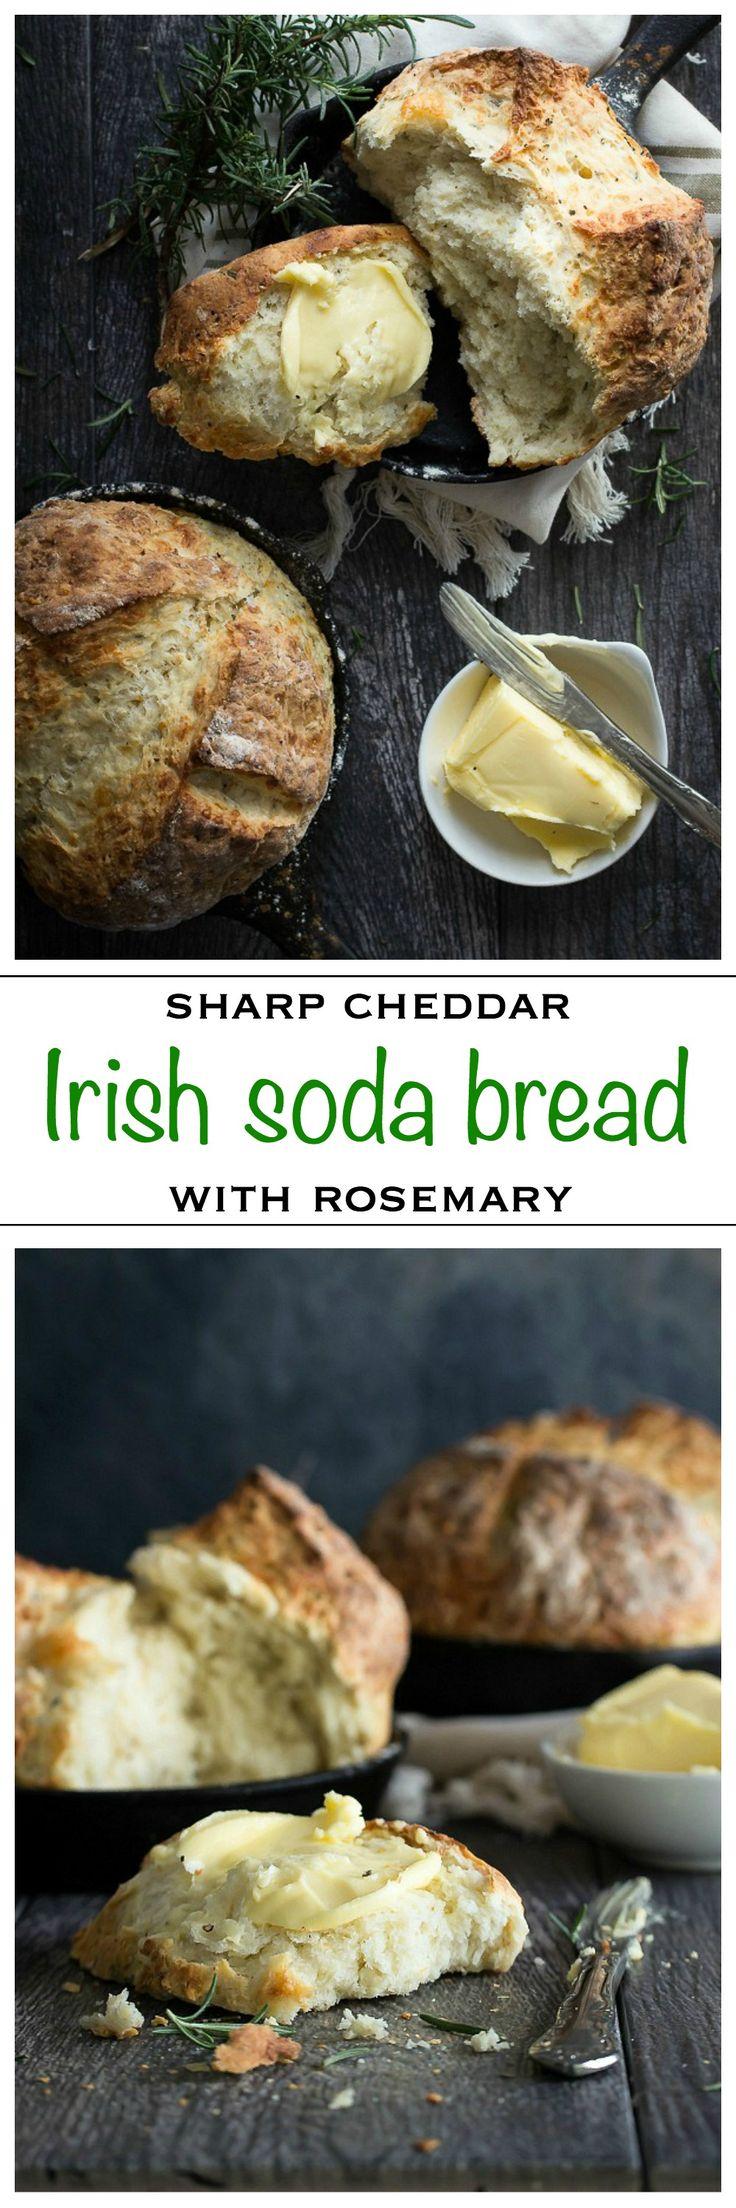 Amazing Irish Soda Bread with sharp cheddar cheese and fresh rosemary | Foodness Gracious